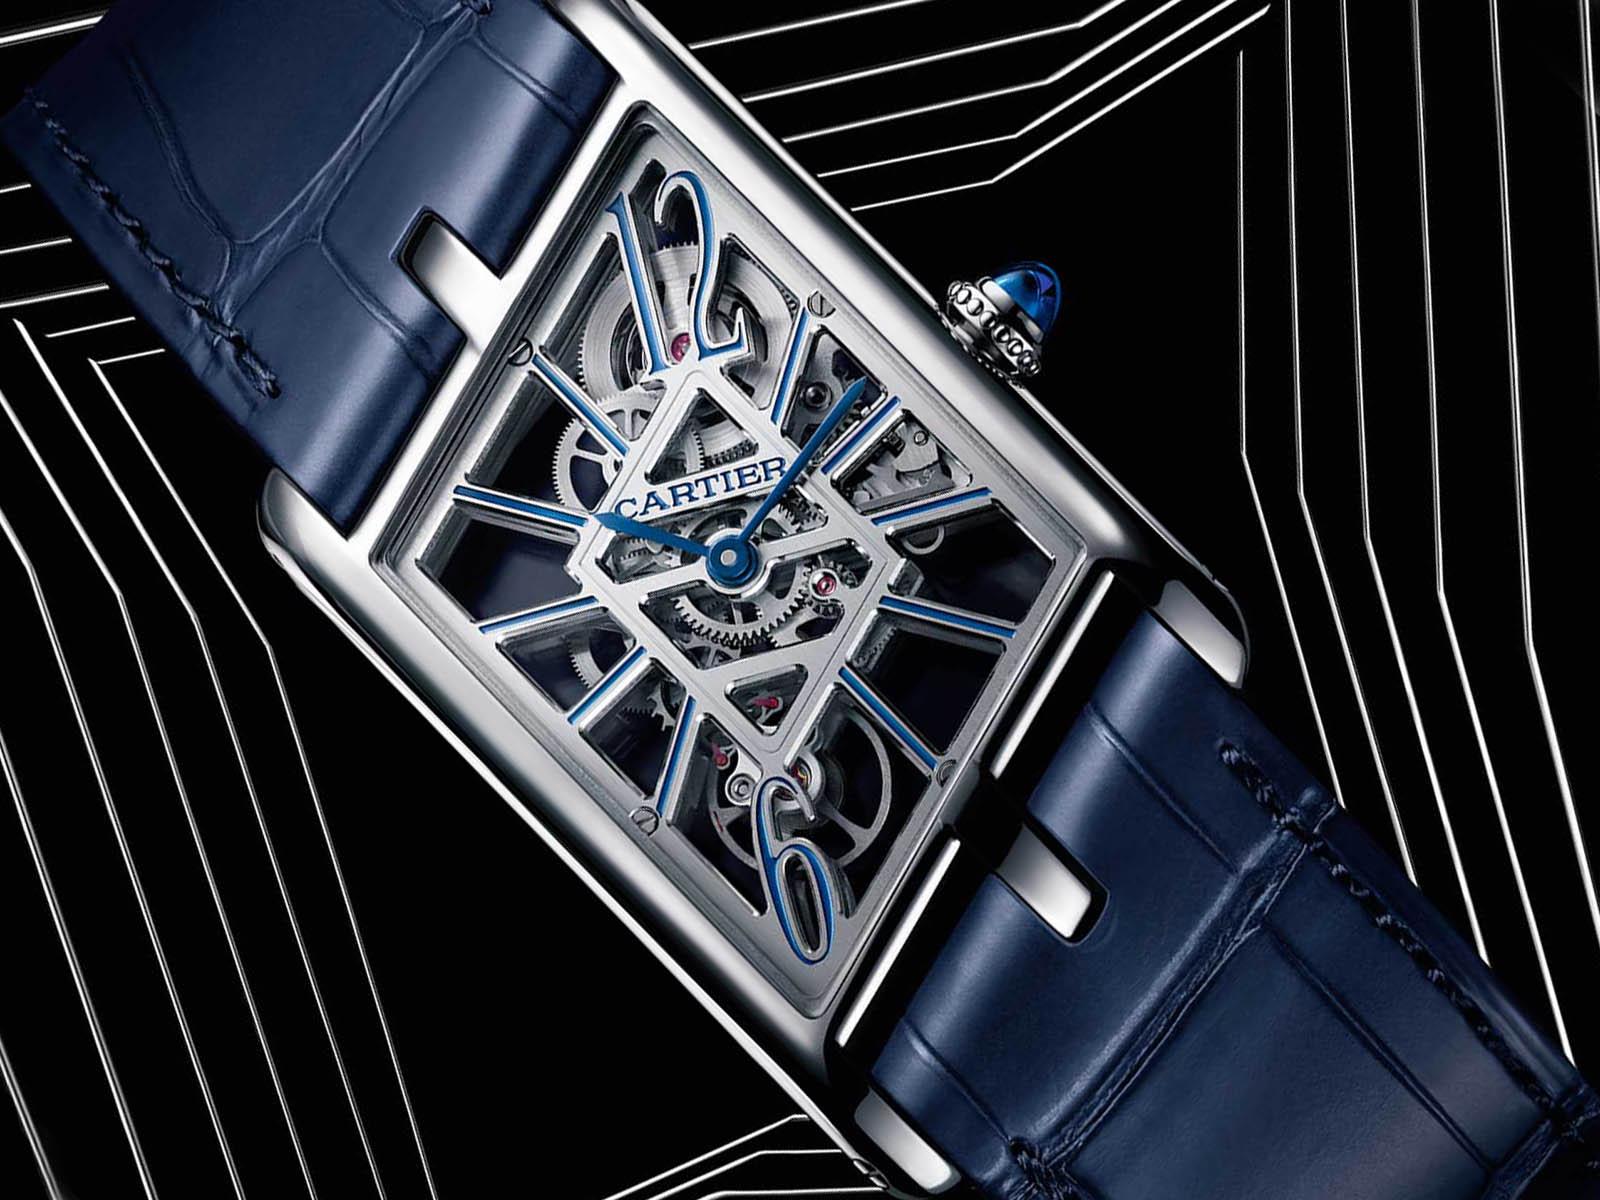 cartier-tank-asymetrique-skeleton-watches-wonders-2020-5.jpg